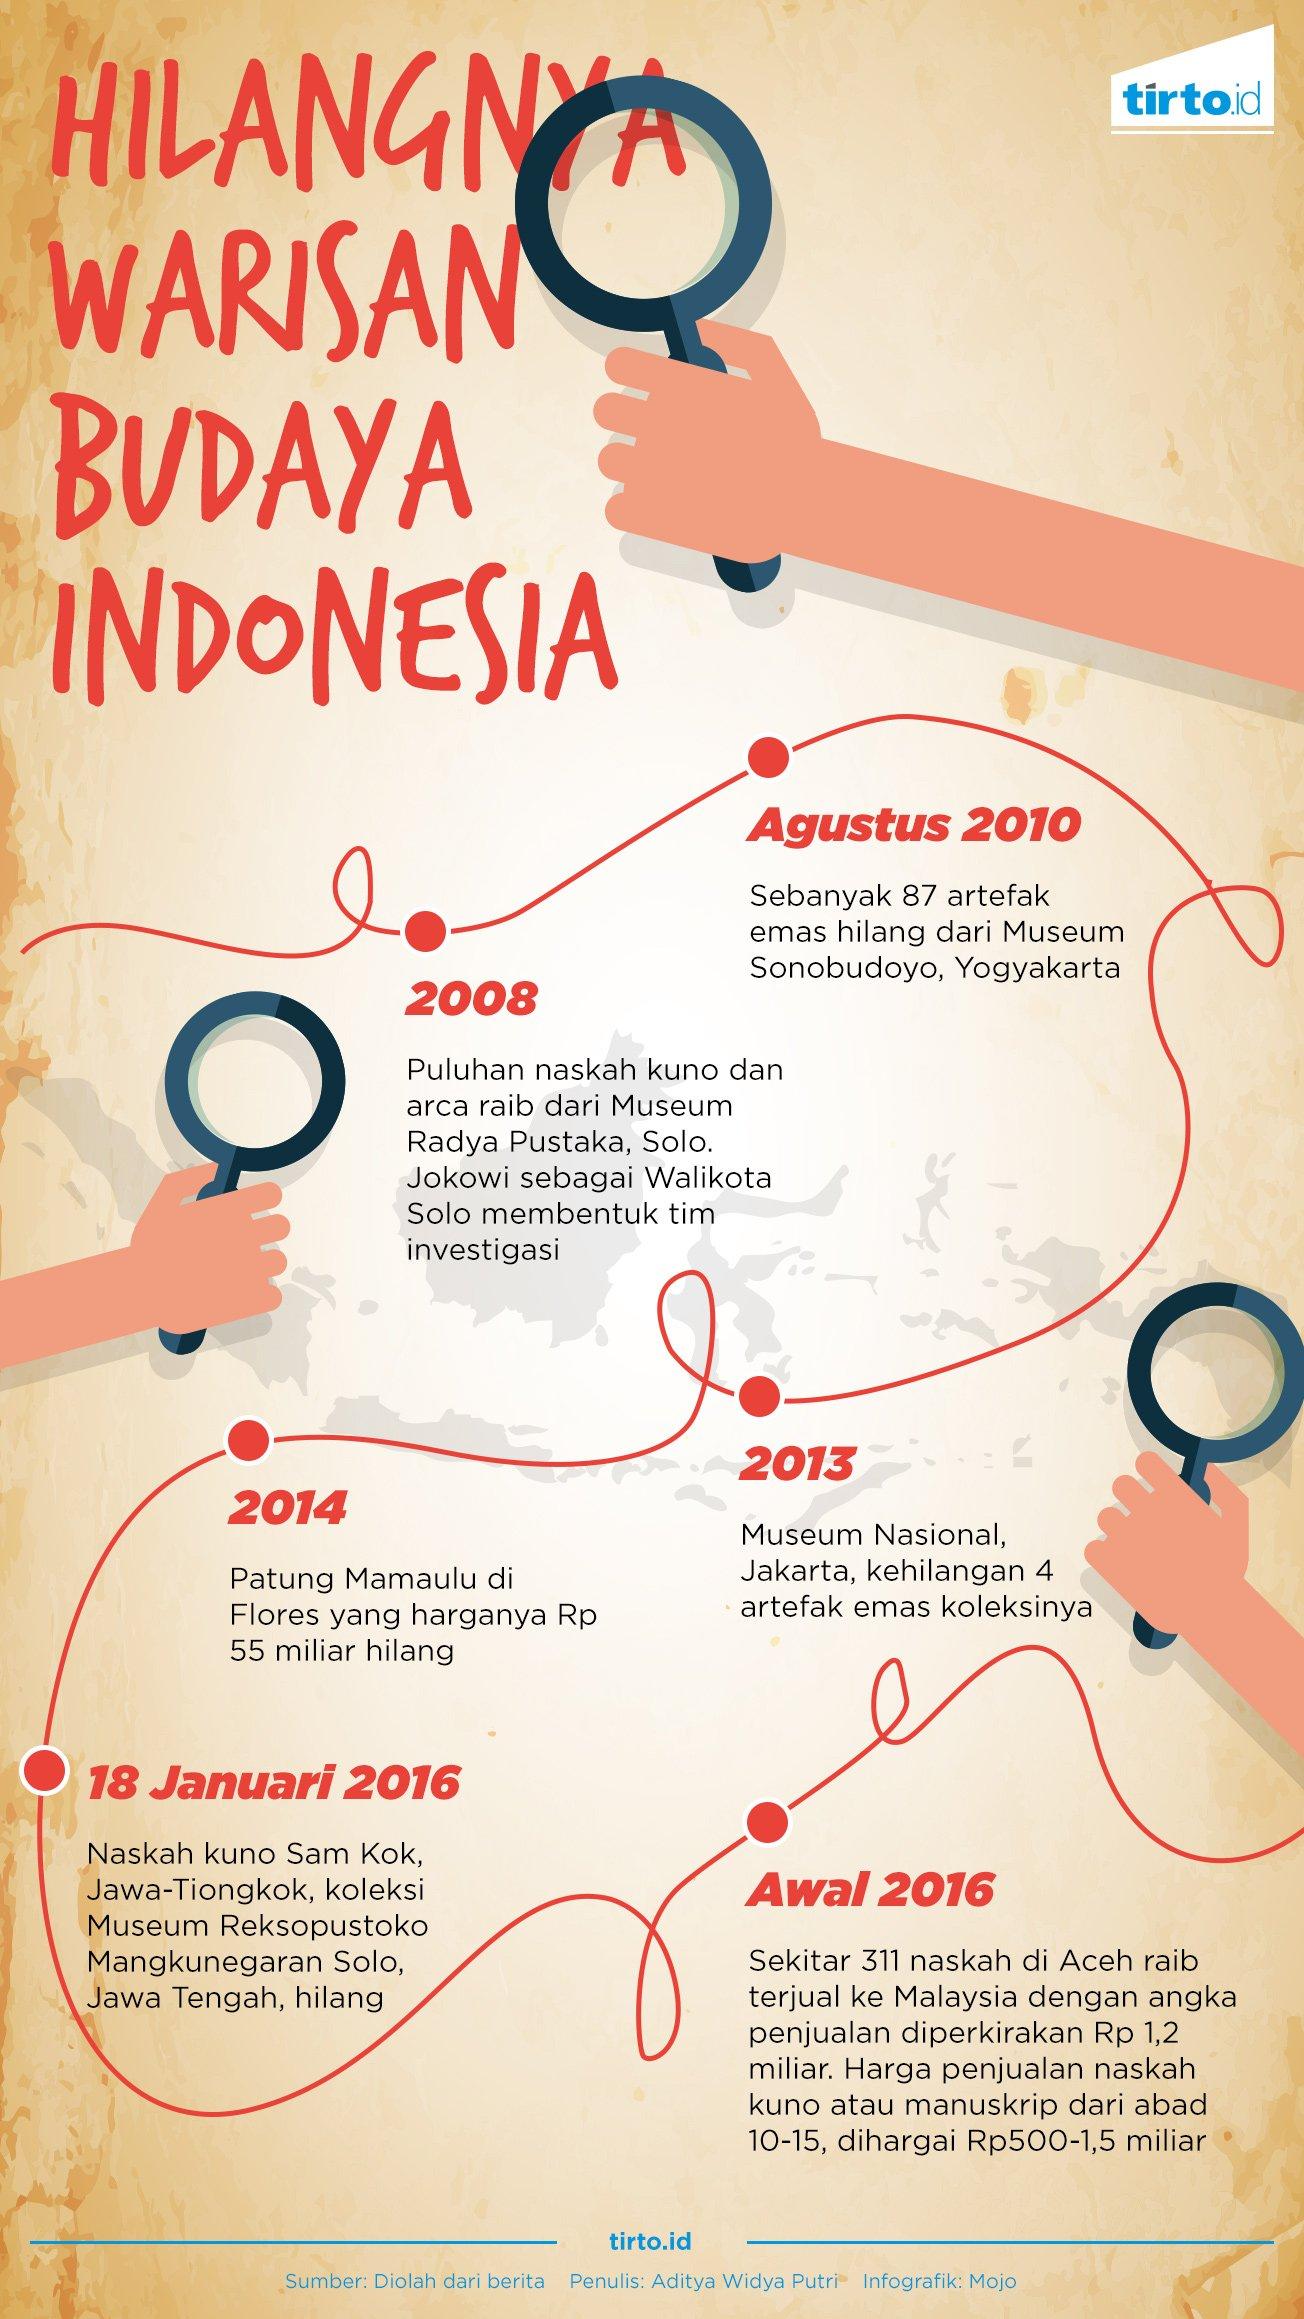 Hilangnya Warisan Budaya Indonesia Tirto Id